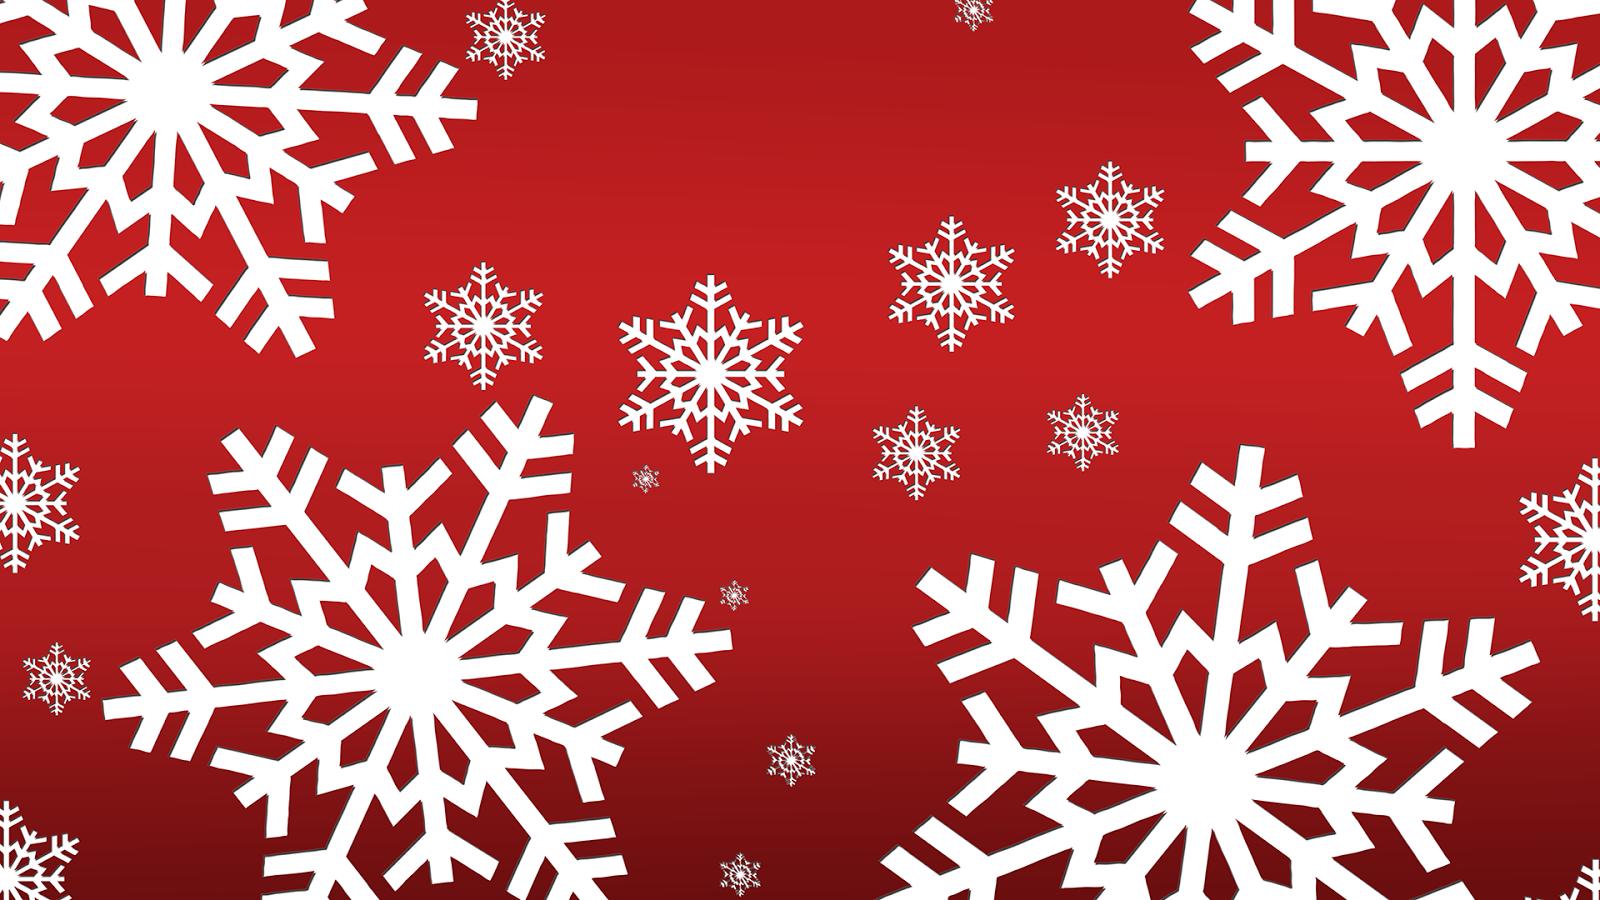 03sfondi Desktop Natalizi Sfondi Natale Desktop Sfondi Natalizi